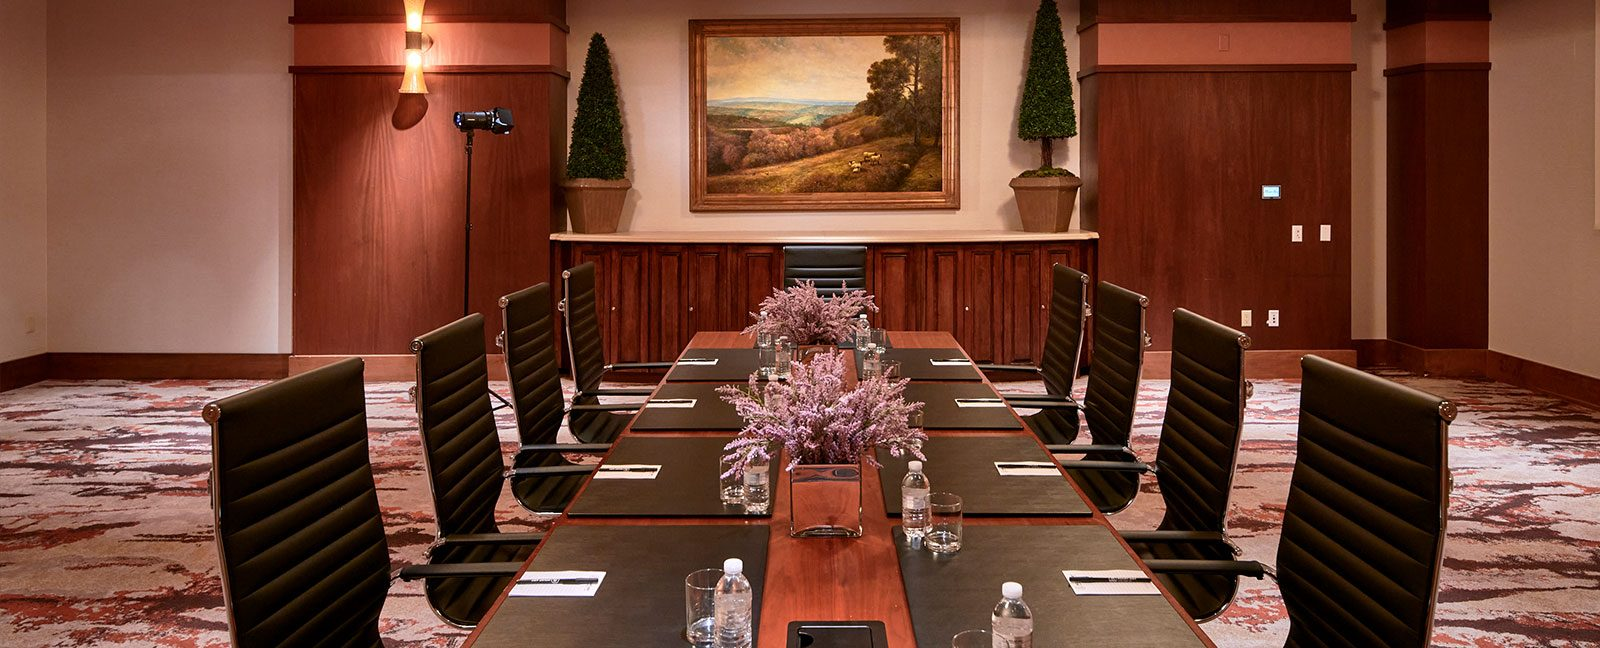 hemlock - business meeting room